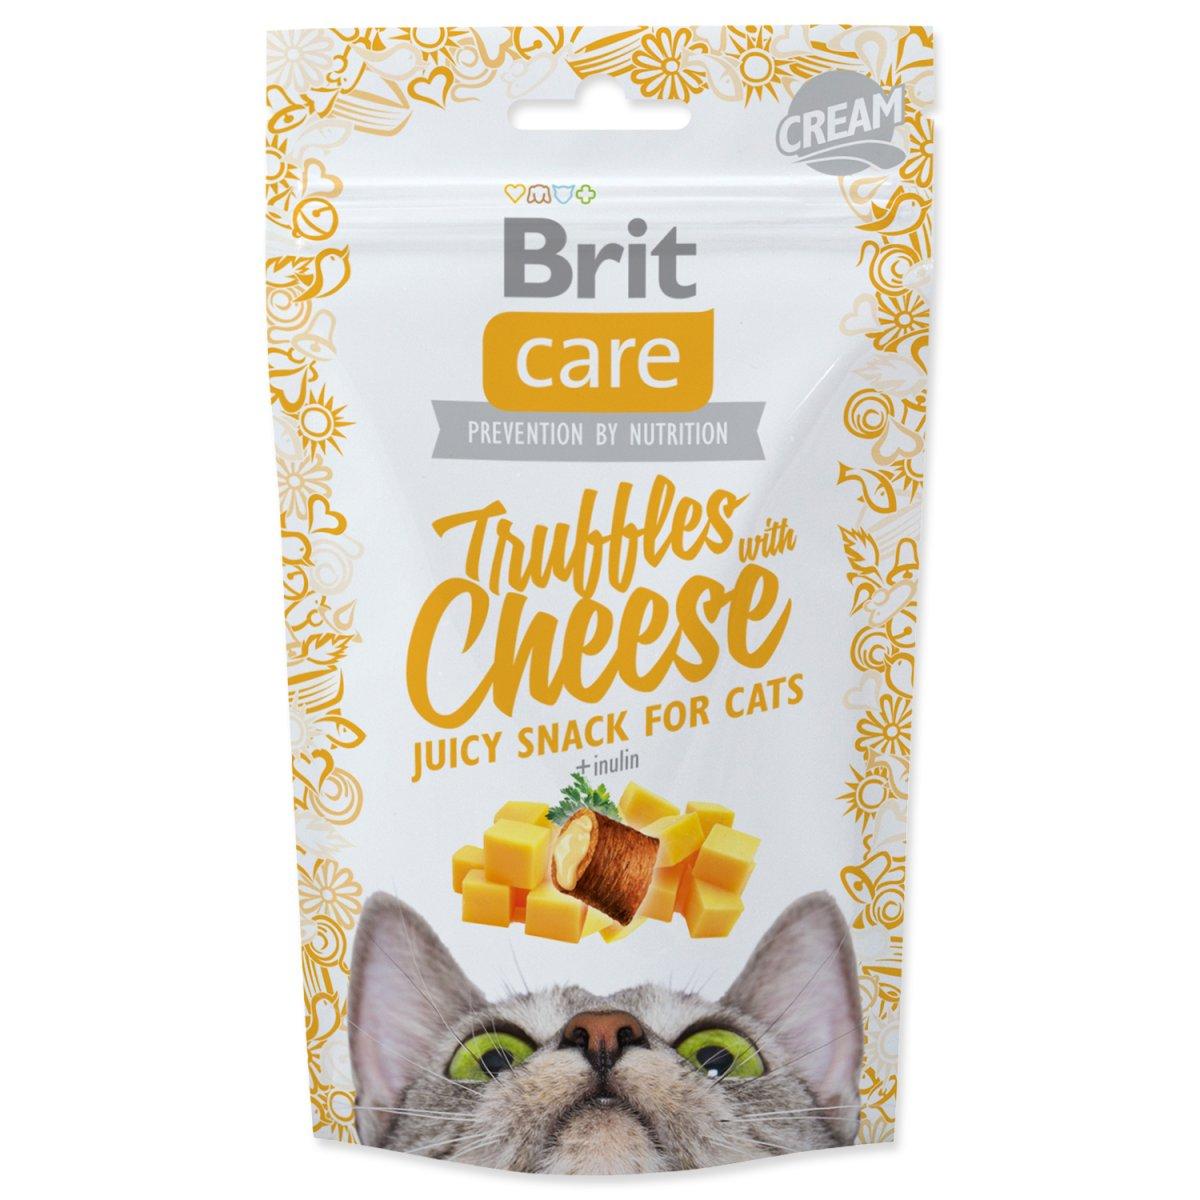 BRIT Care Cat Snack Truffles Cheese (50g)